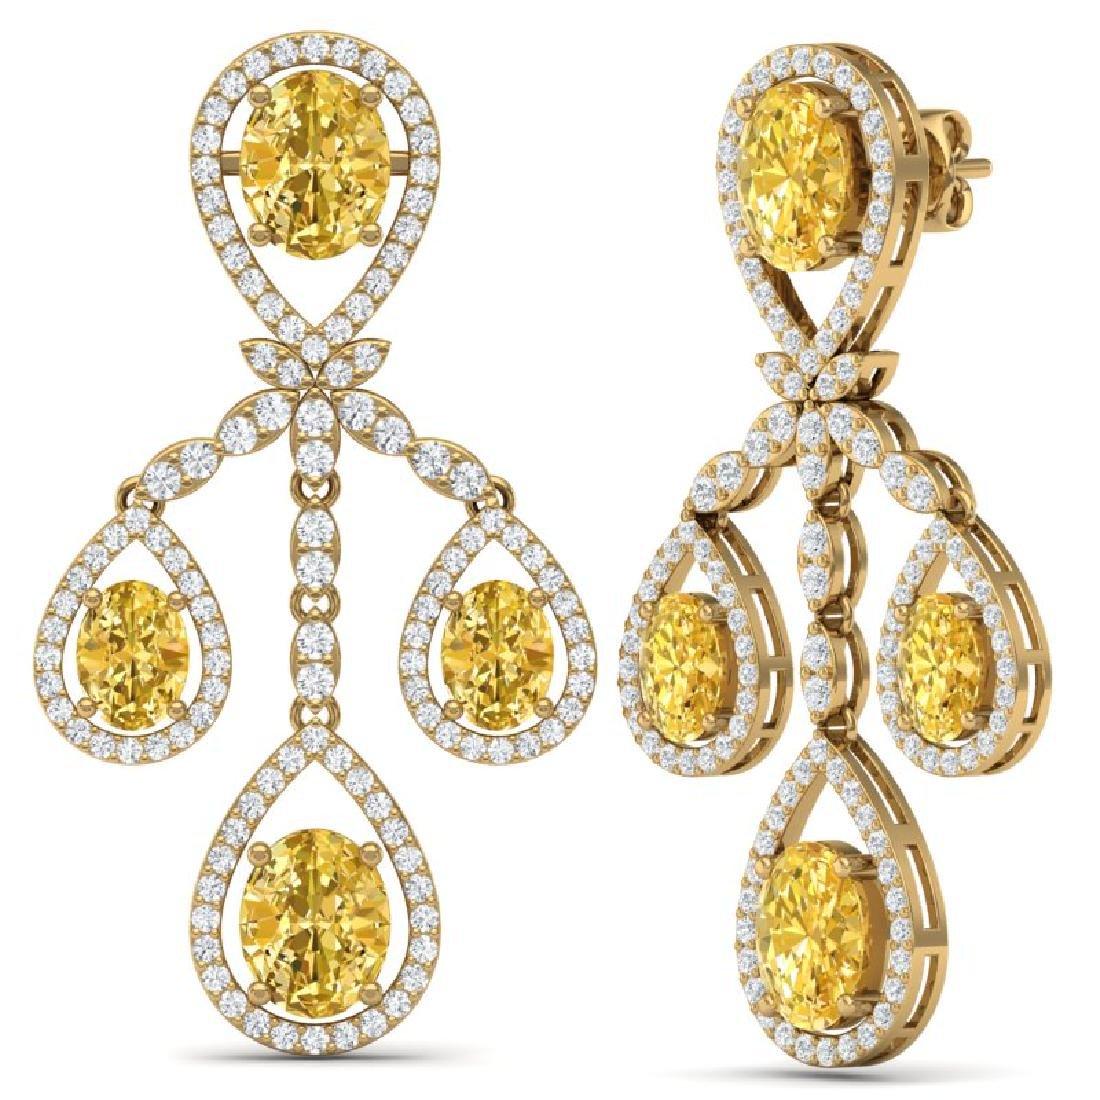 20.69 CTW Royalty Canary Citrine & VS Diamond Earrings - 3